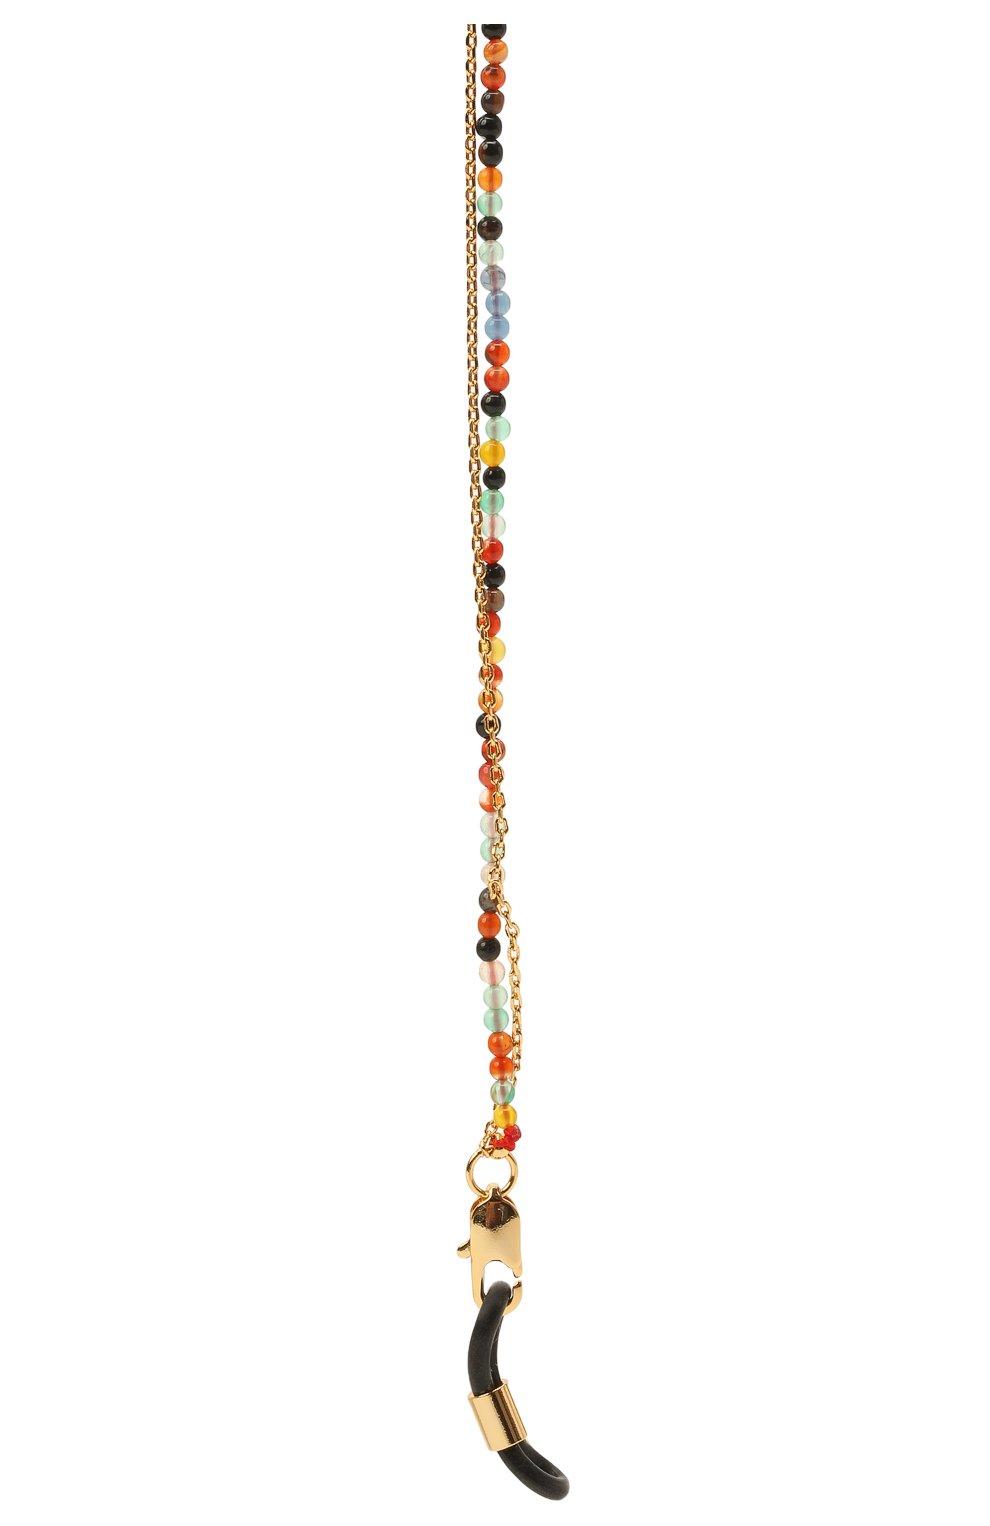 Женские цепочка для очков FRAME CHAIN разноцветного цвета, арт. IT`S A WRAP YELL0W G0LD   Фото 2 (Тип очков: Цепочка)